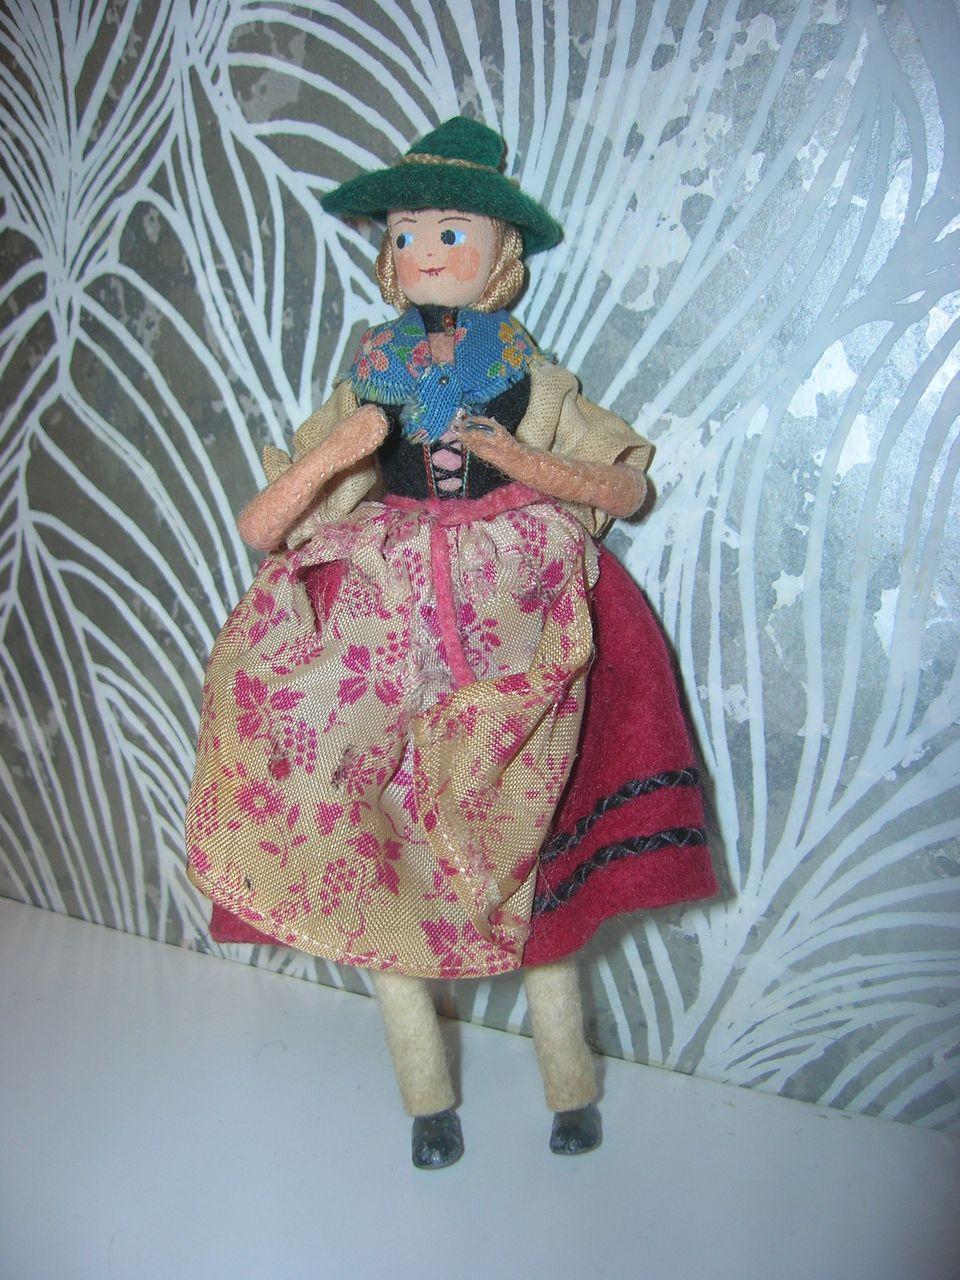 Vintage German BAPS Ethic Lady Doll